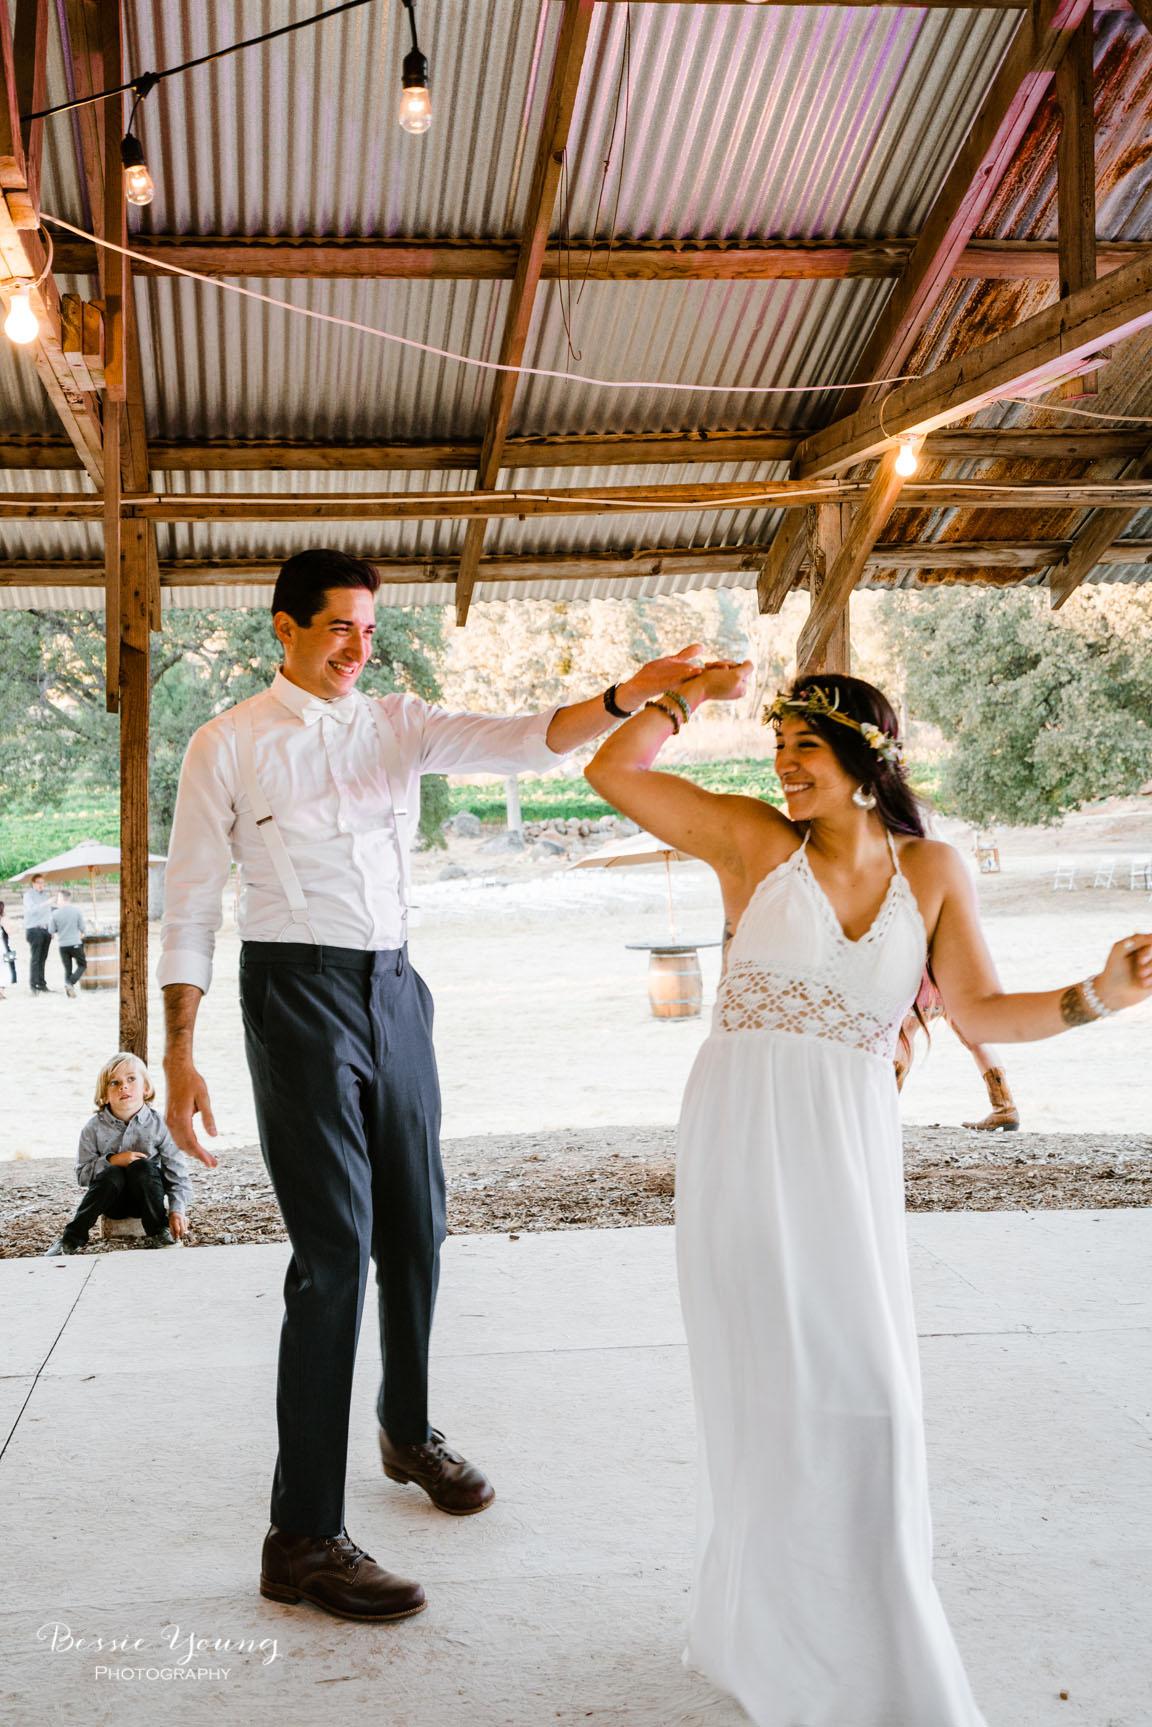 Zuni Vineyards Wedding Sonora - Samira and Justin Bessie Young Photography 2018 a-102.jpg